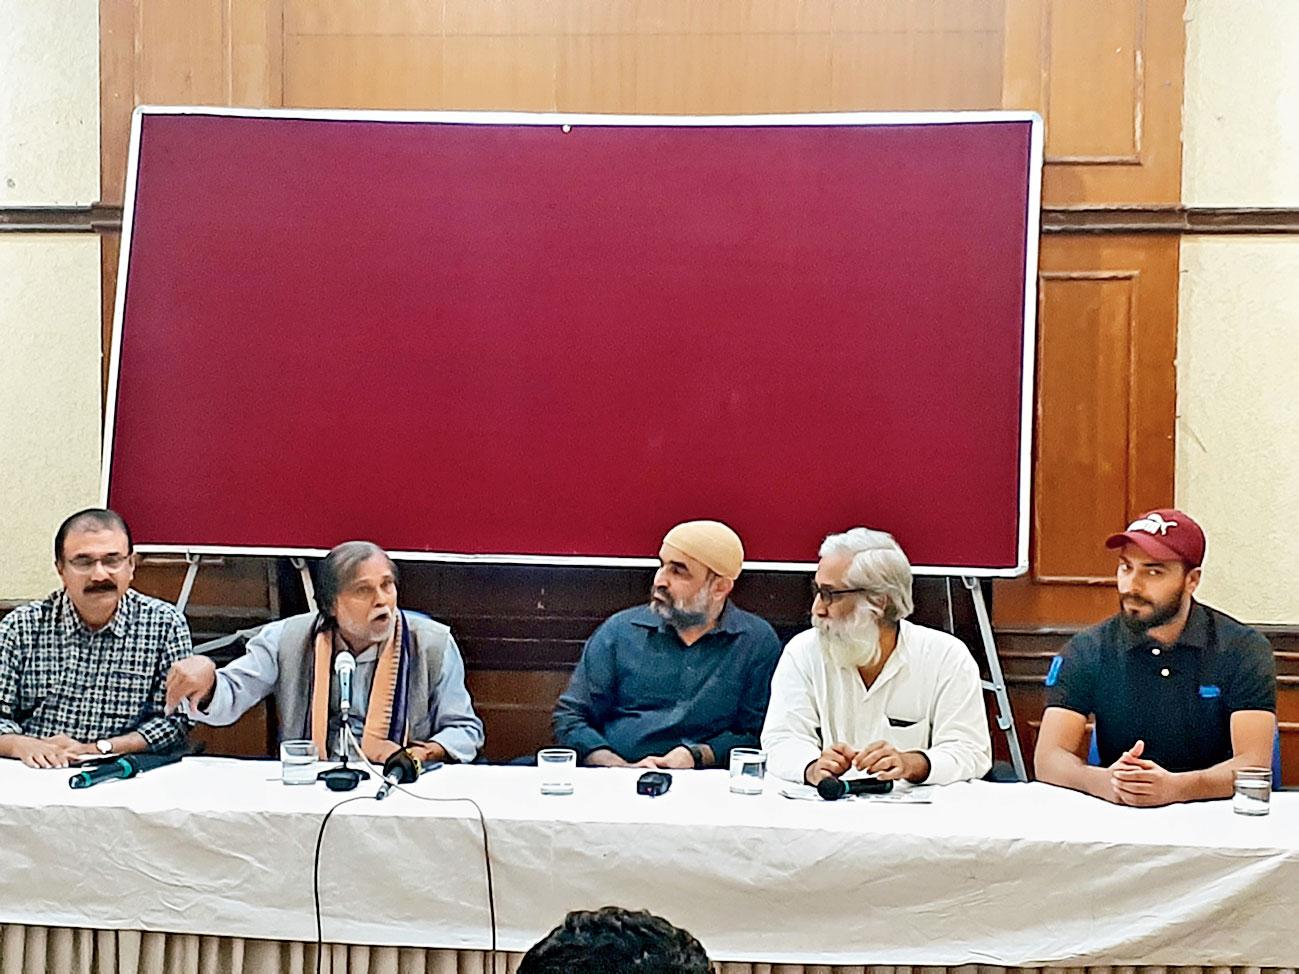 (From left) Musthafa Mohamed, Prafulla Samantara, Faisal Khan, Sandeep Pandey and Mohammed Javed at the Press Club of India in New Delhi on Saturday.